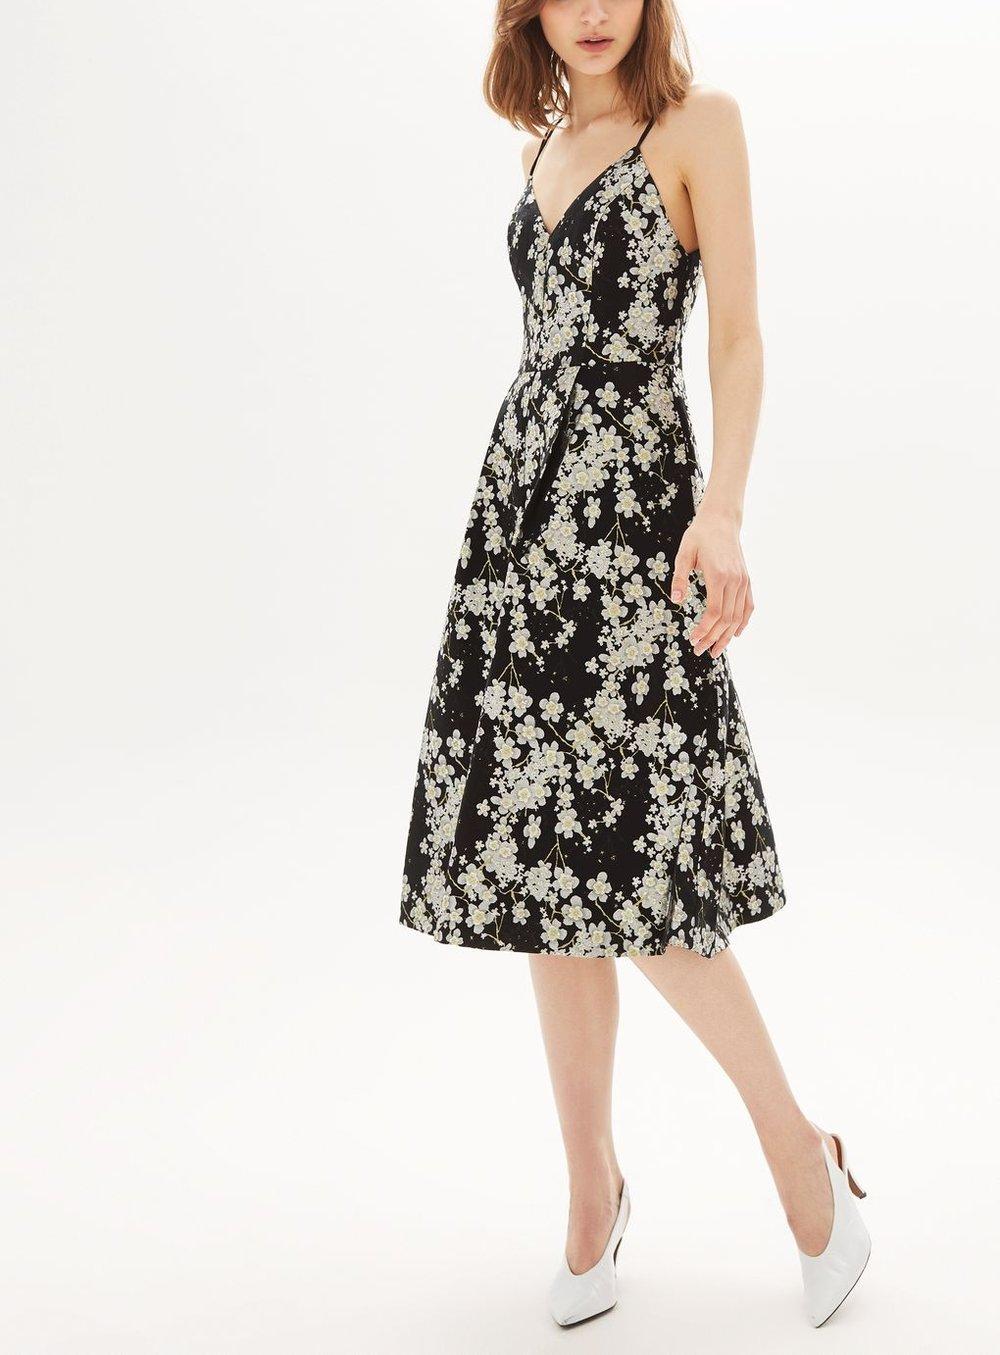 topshop-daisy-jacquard-midi-prom-dress-2.jpg